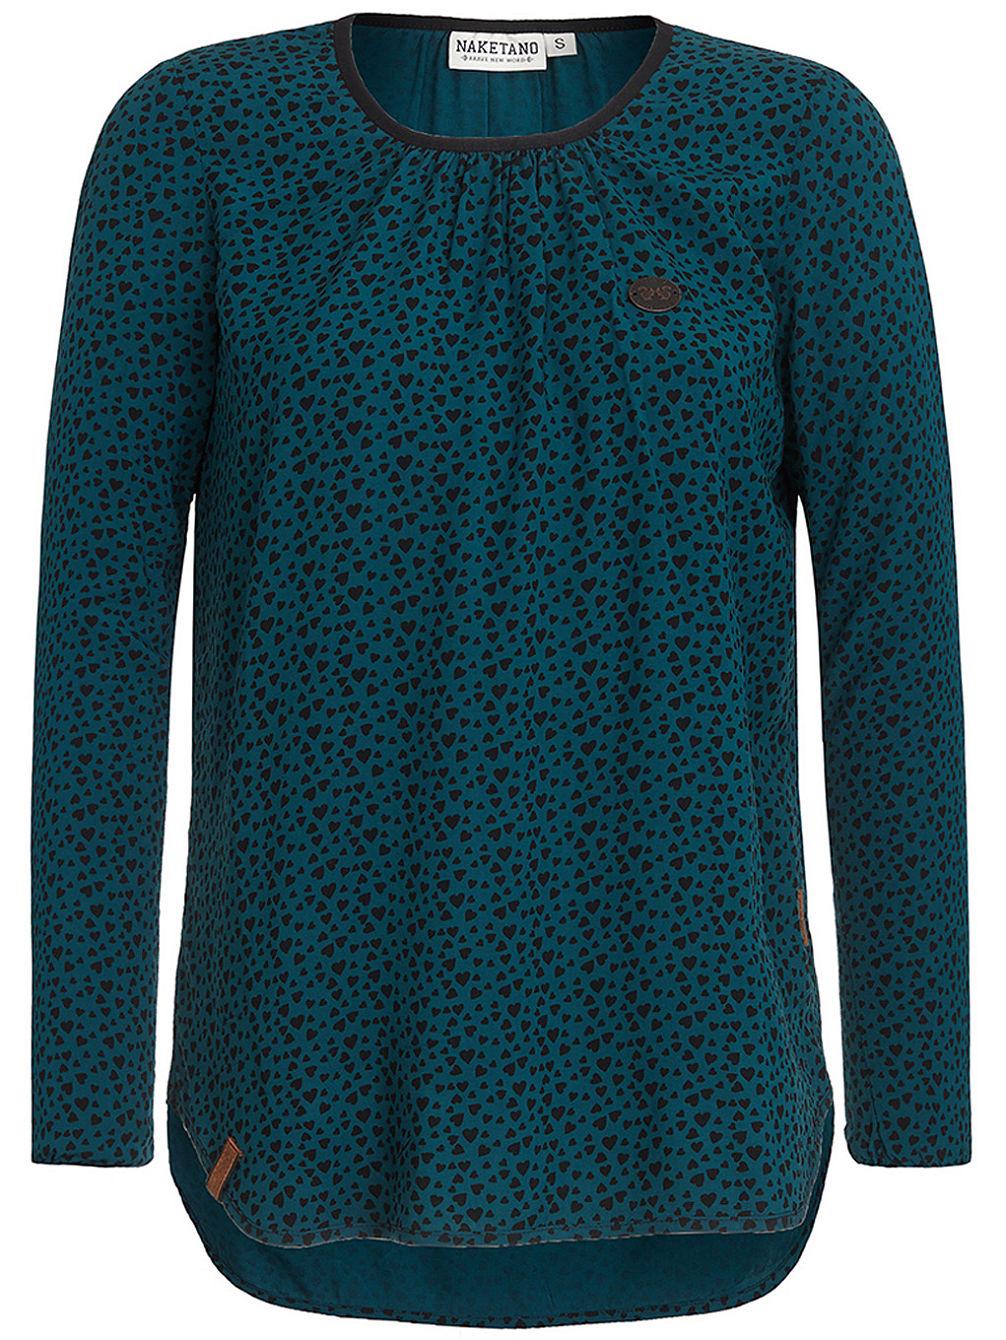 naketano-oma-auf-dem-opa-sweater